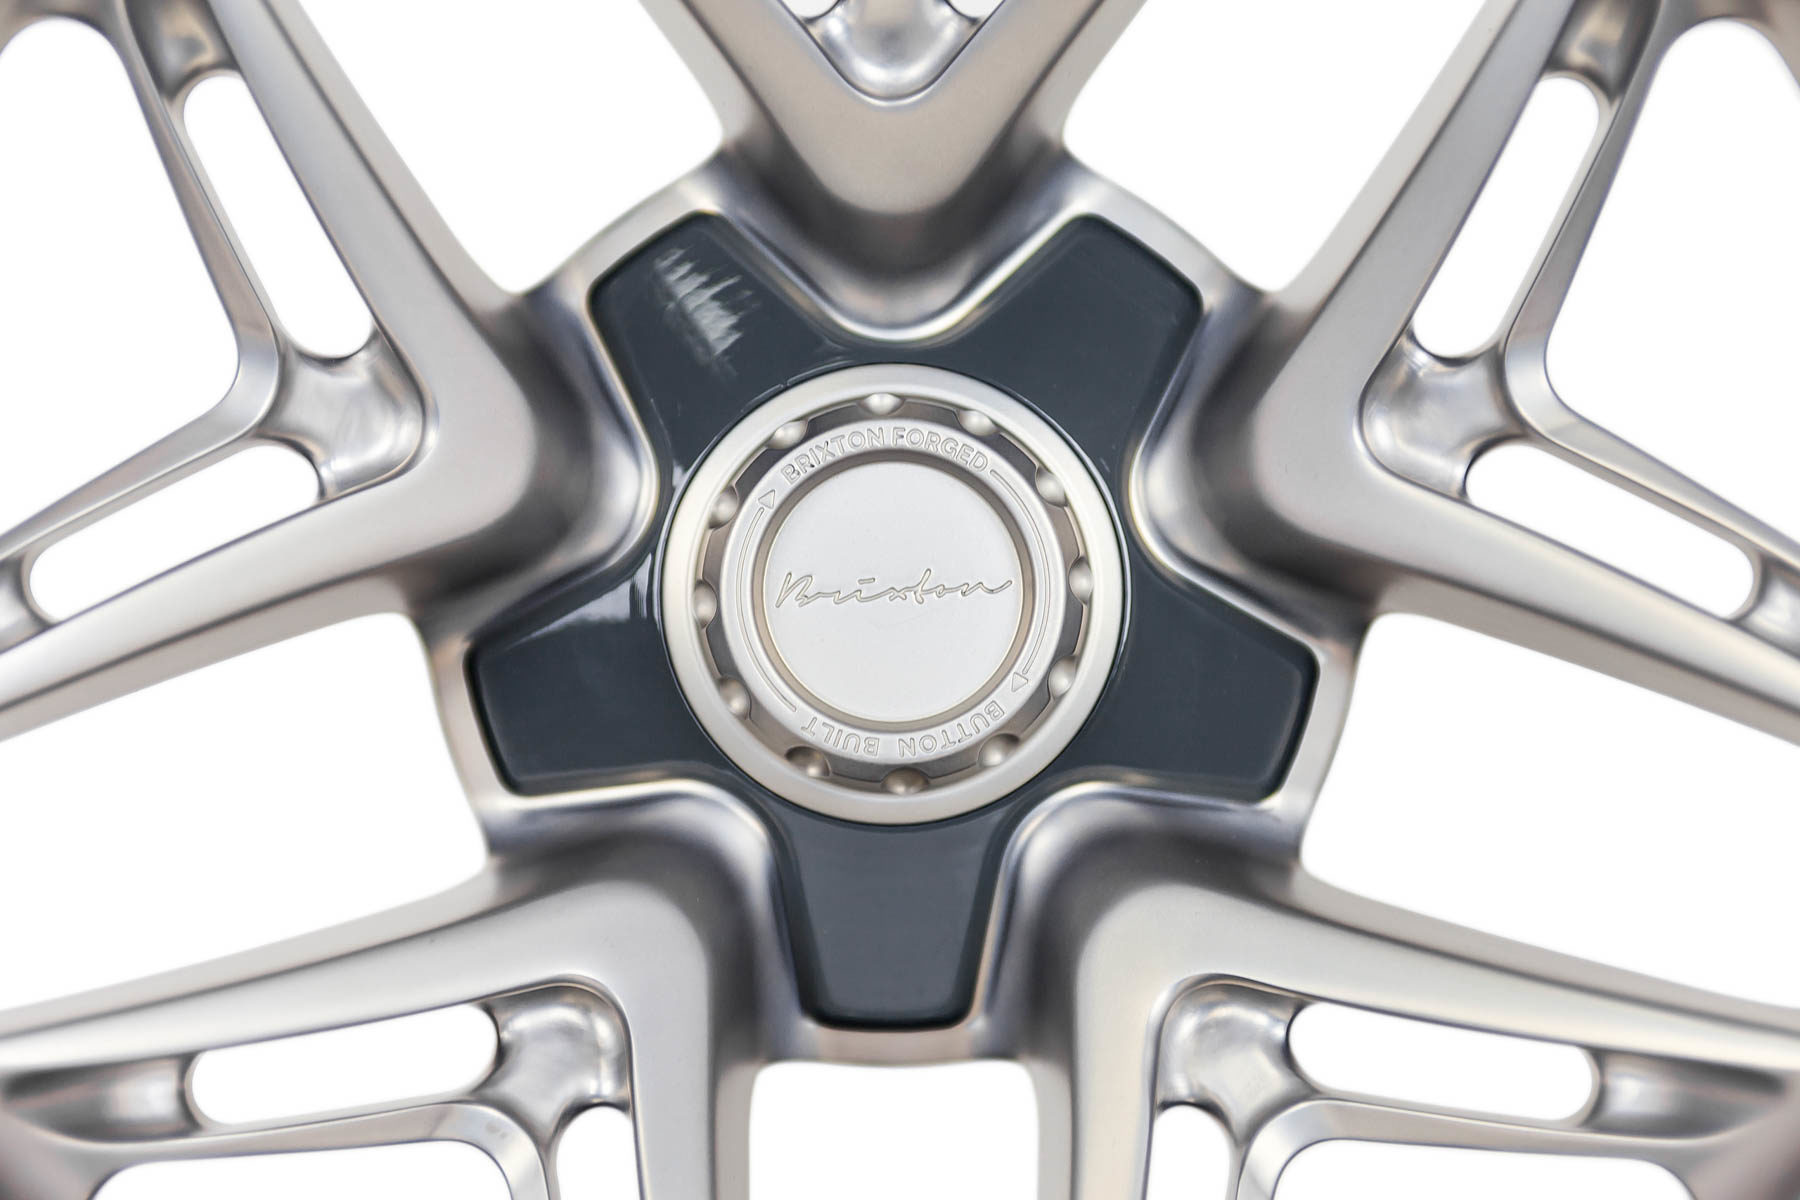 brixton-forged-button-built-ferrari-328-gts-brixton-forged-bb01-6-1-1800x1200.jpg